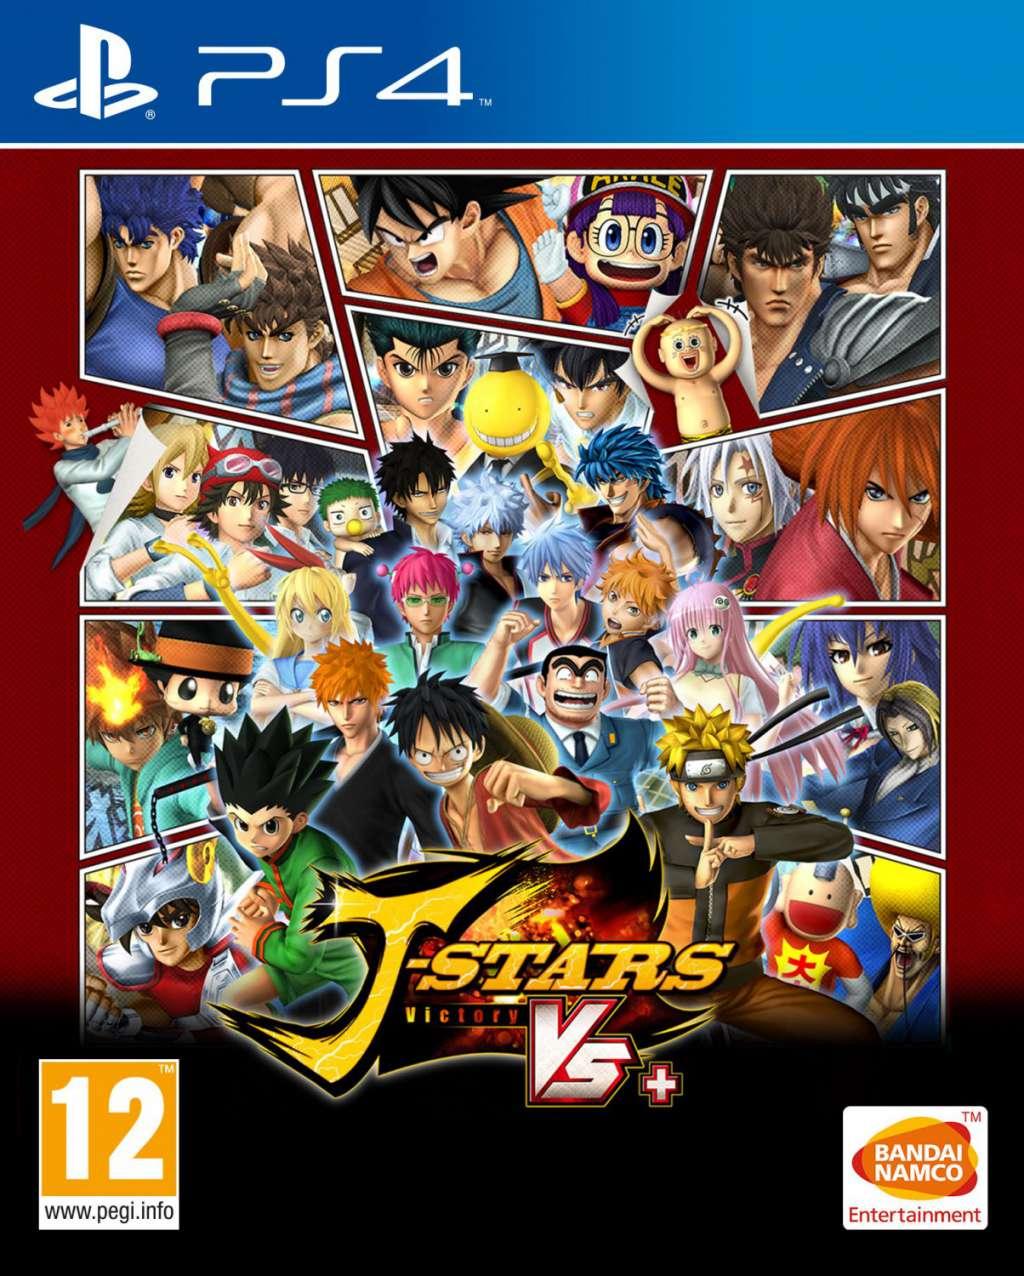 J-Stars Victory Vs PS4 Portada